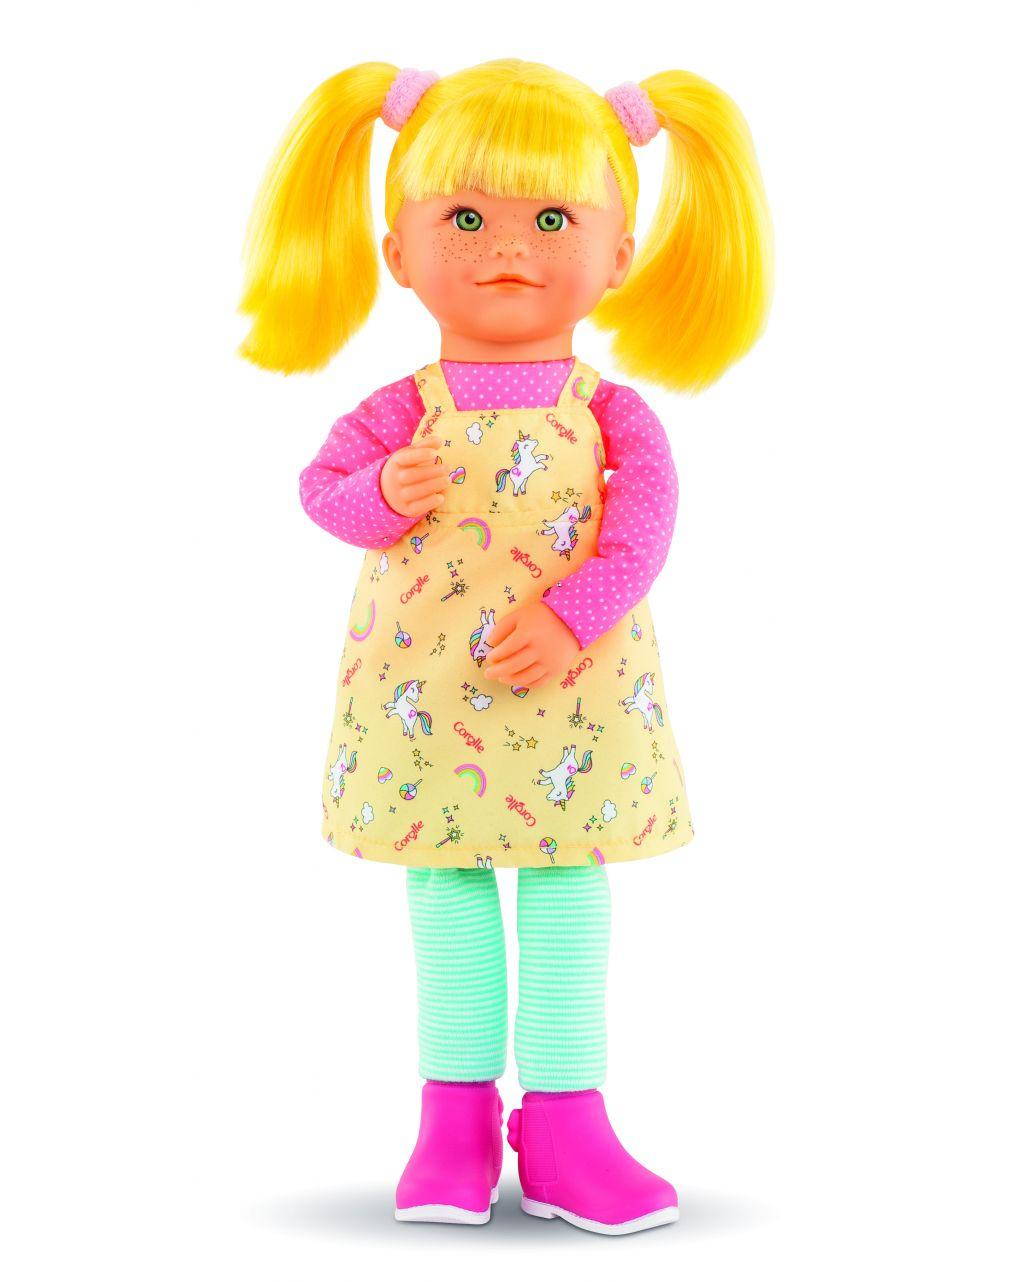 Corolle - rainbow doll - celeste - Corolle